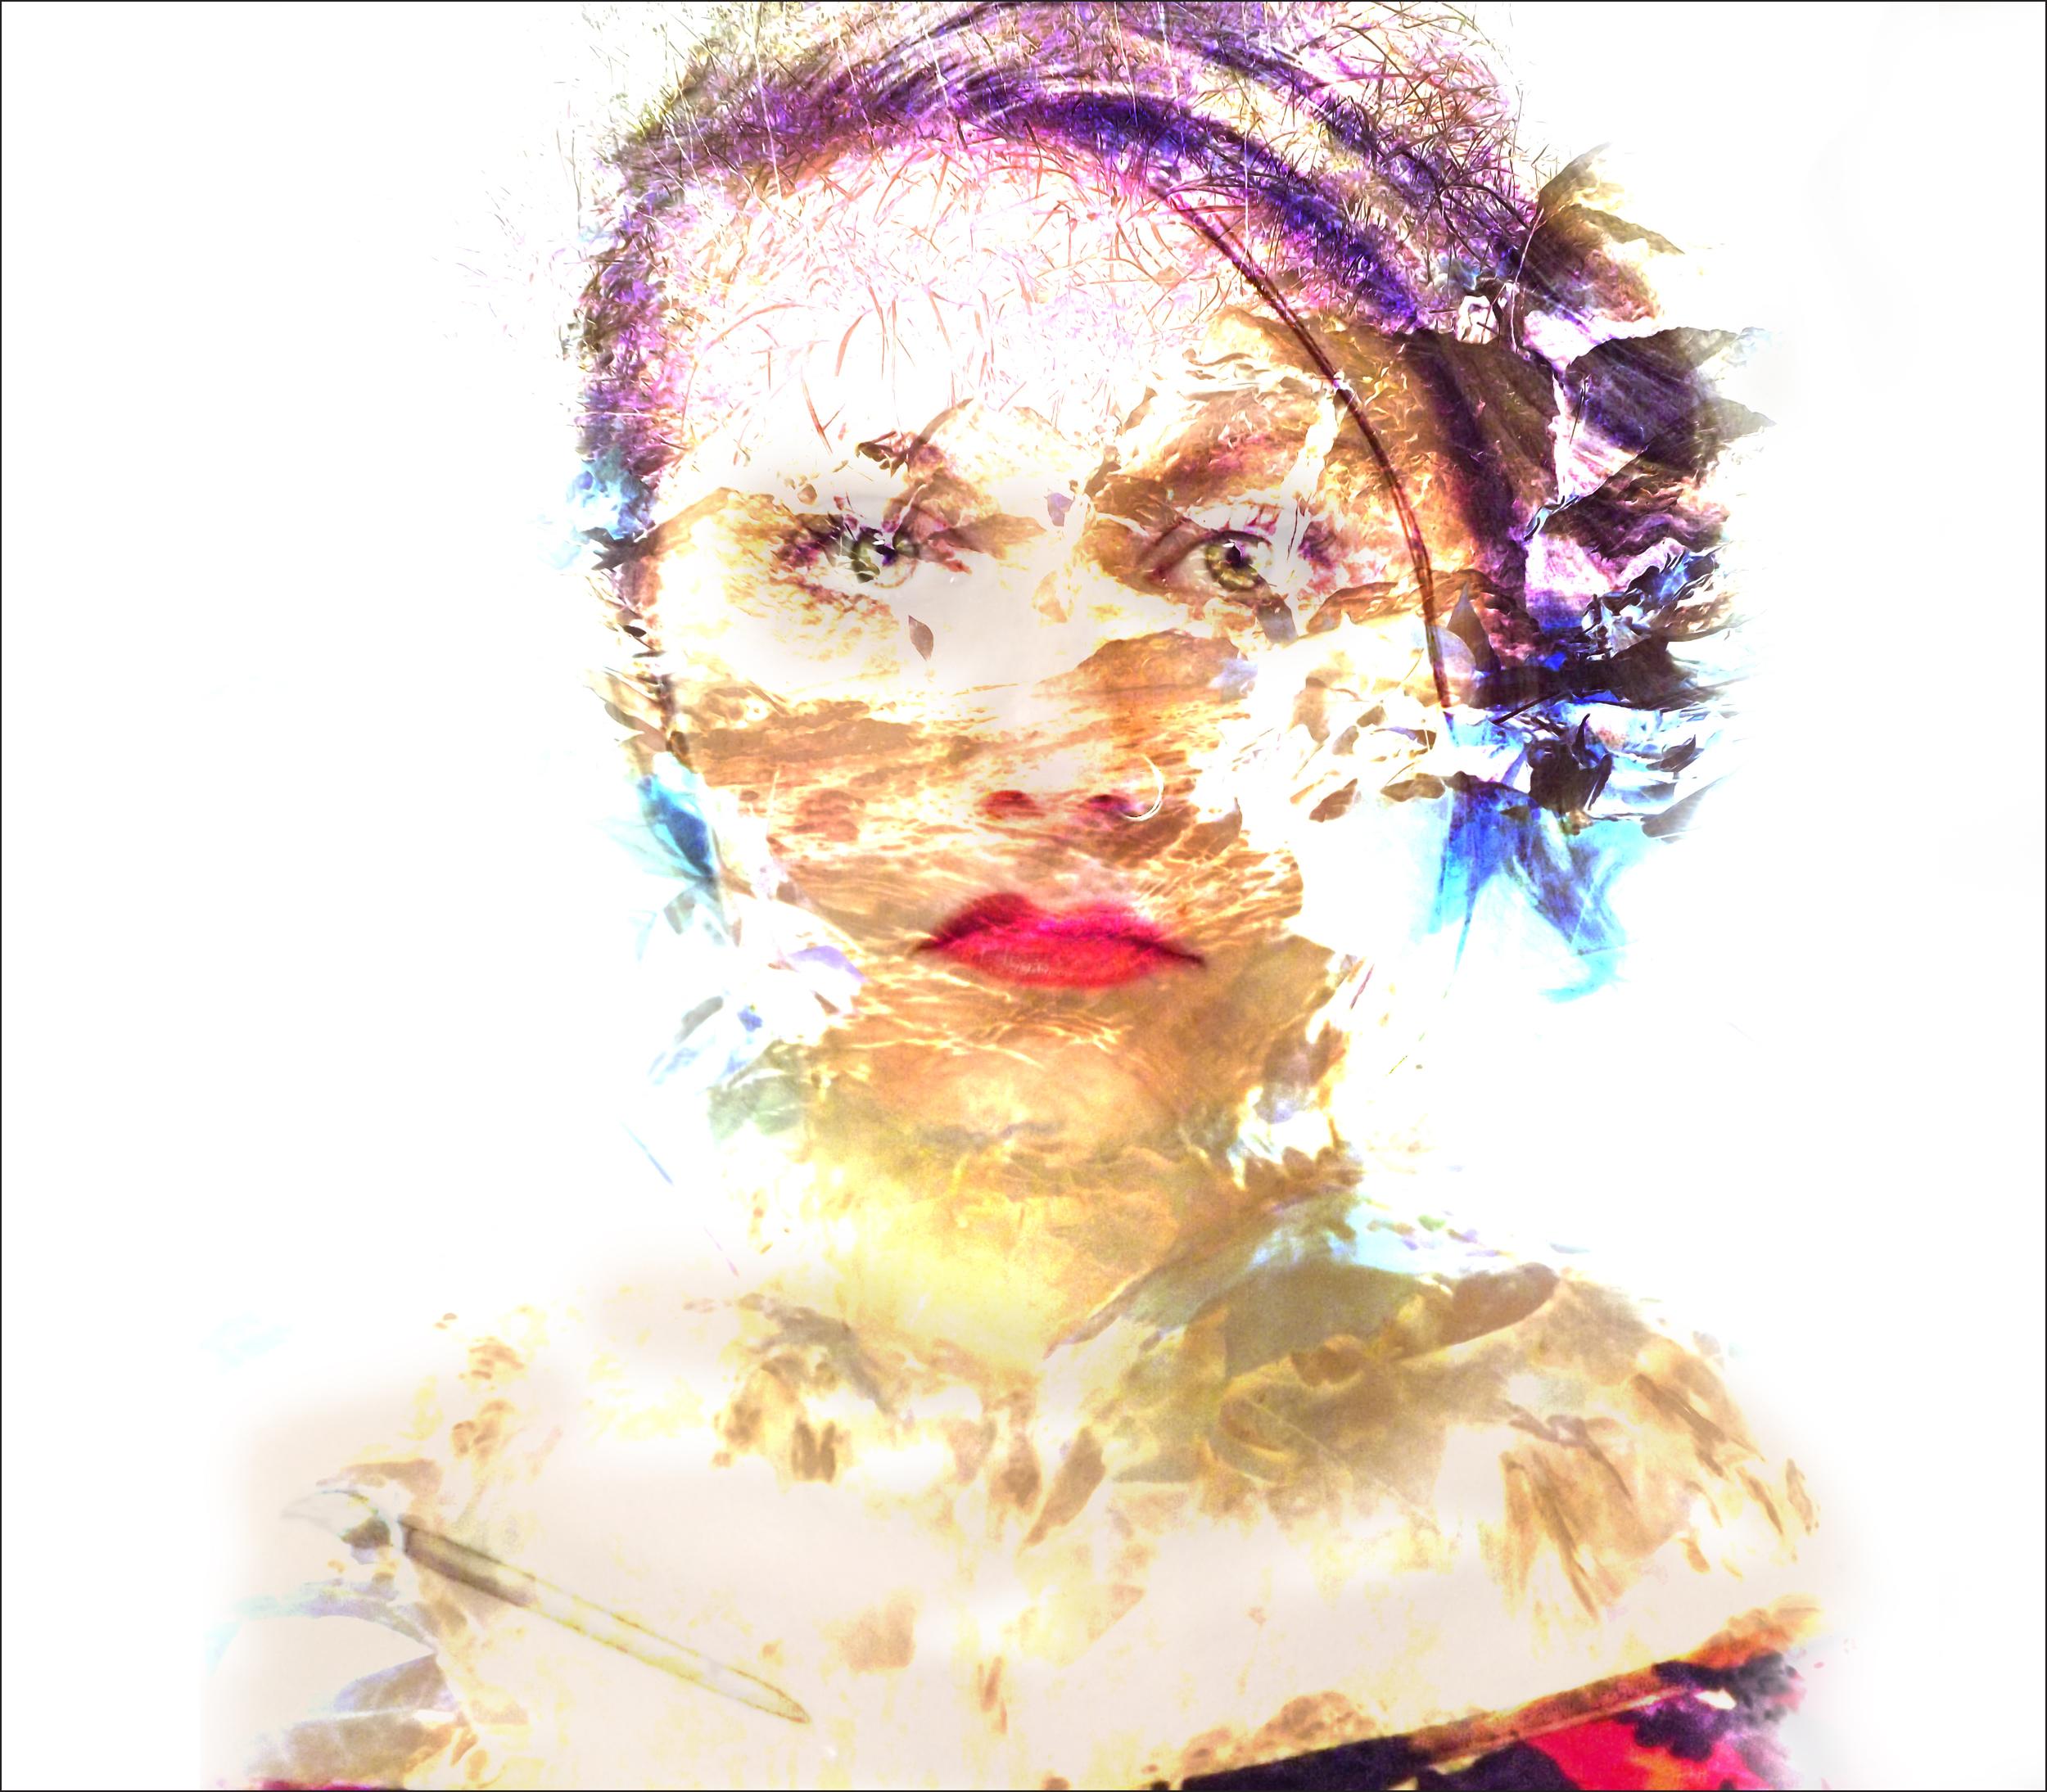 ART140 Digital Photography - Multiple Exposure: Jordyn Boberg